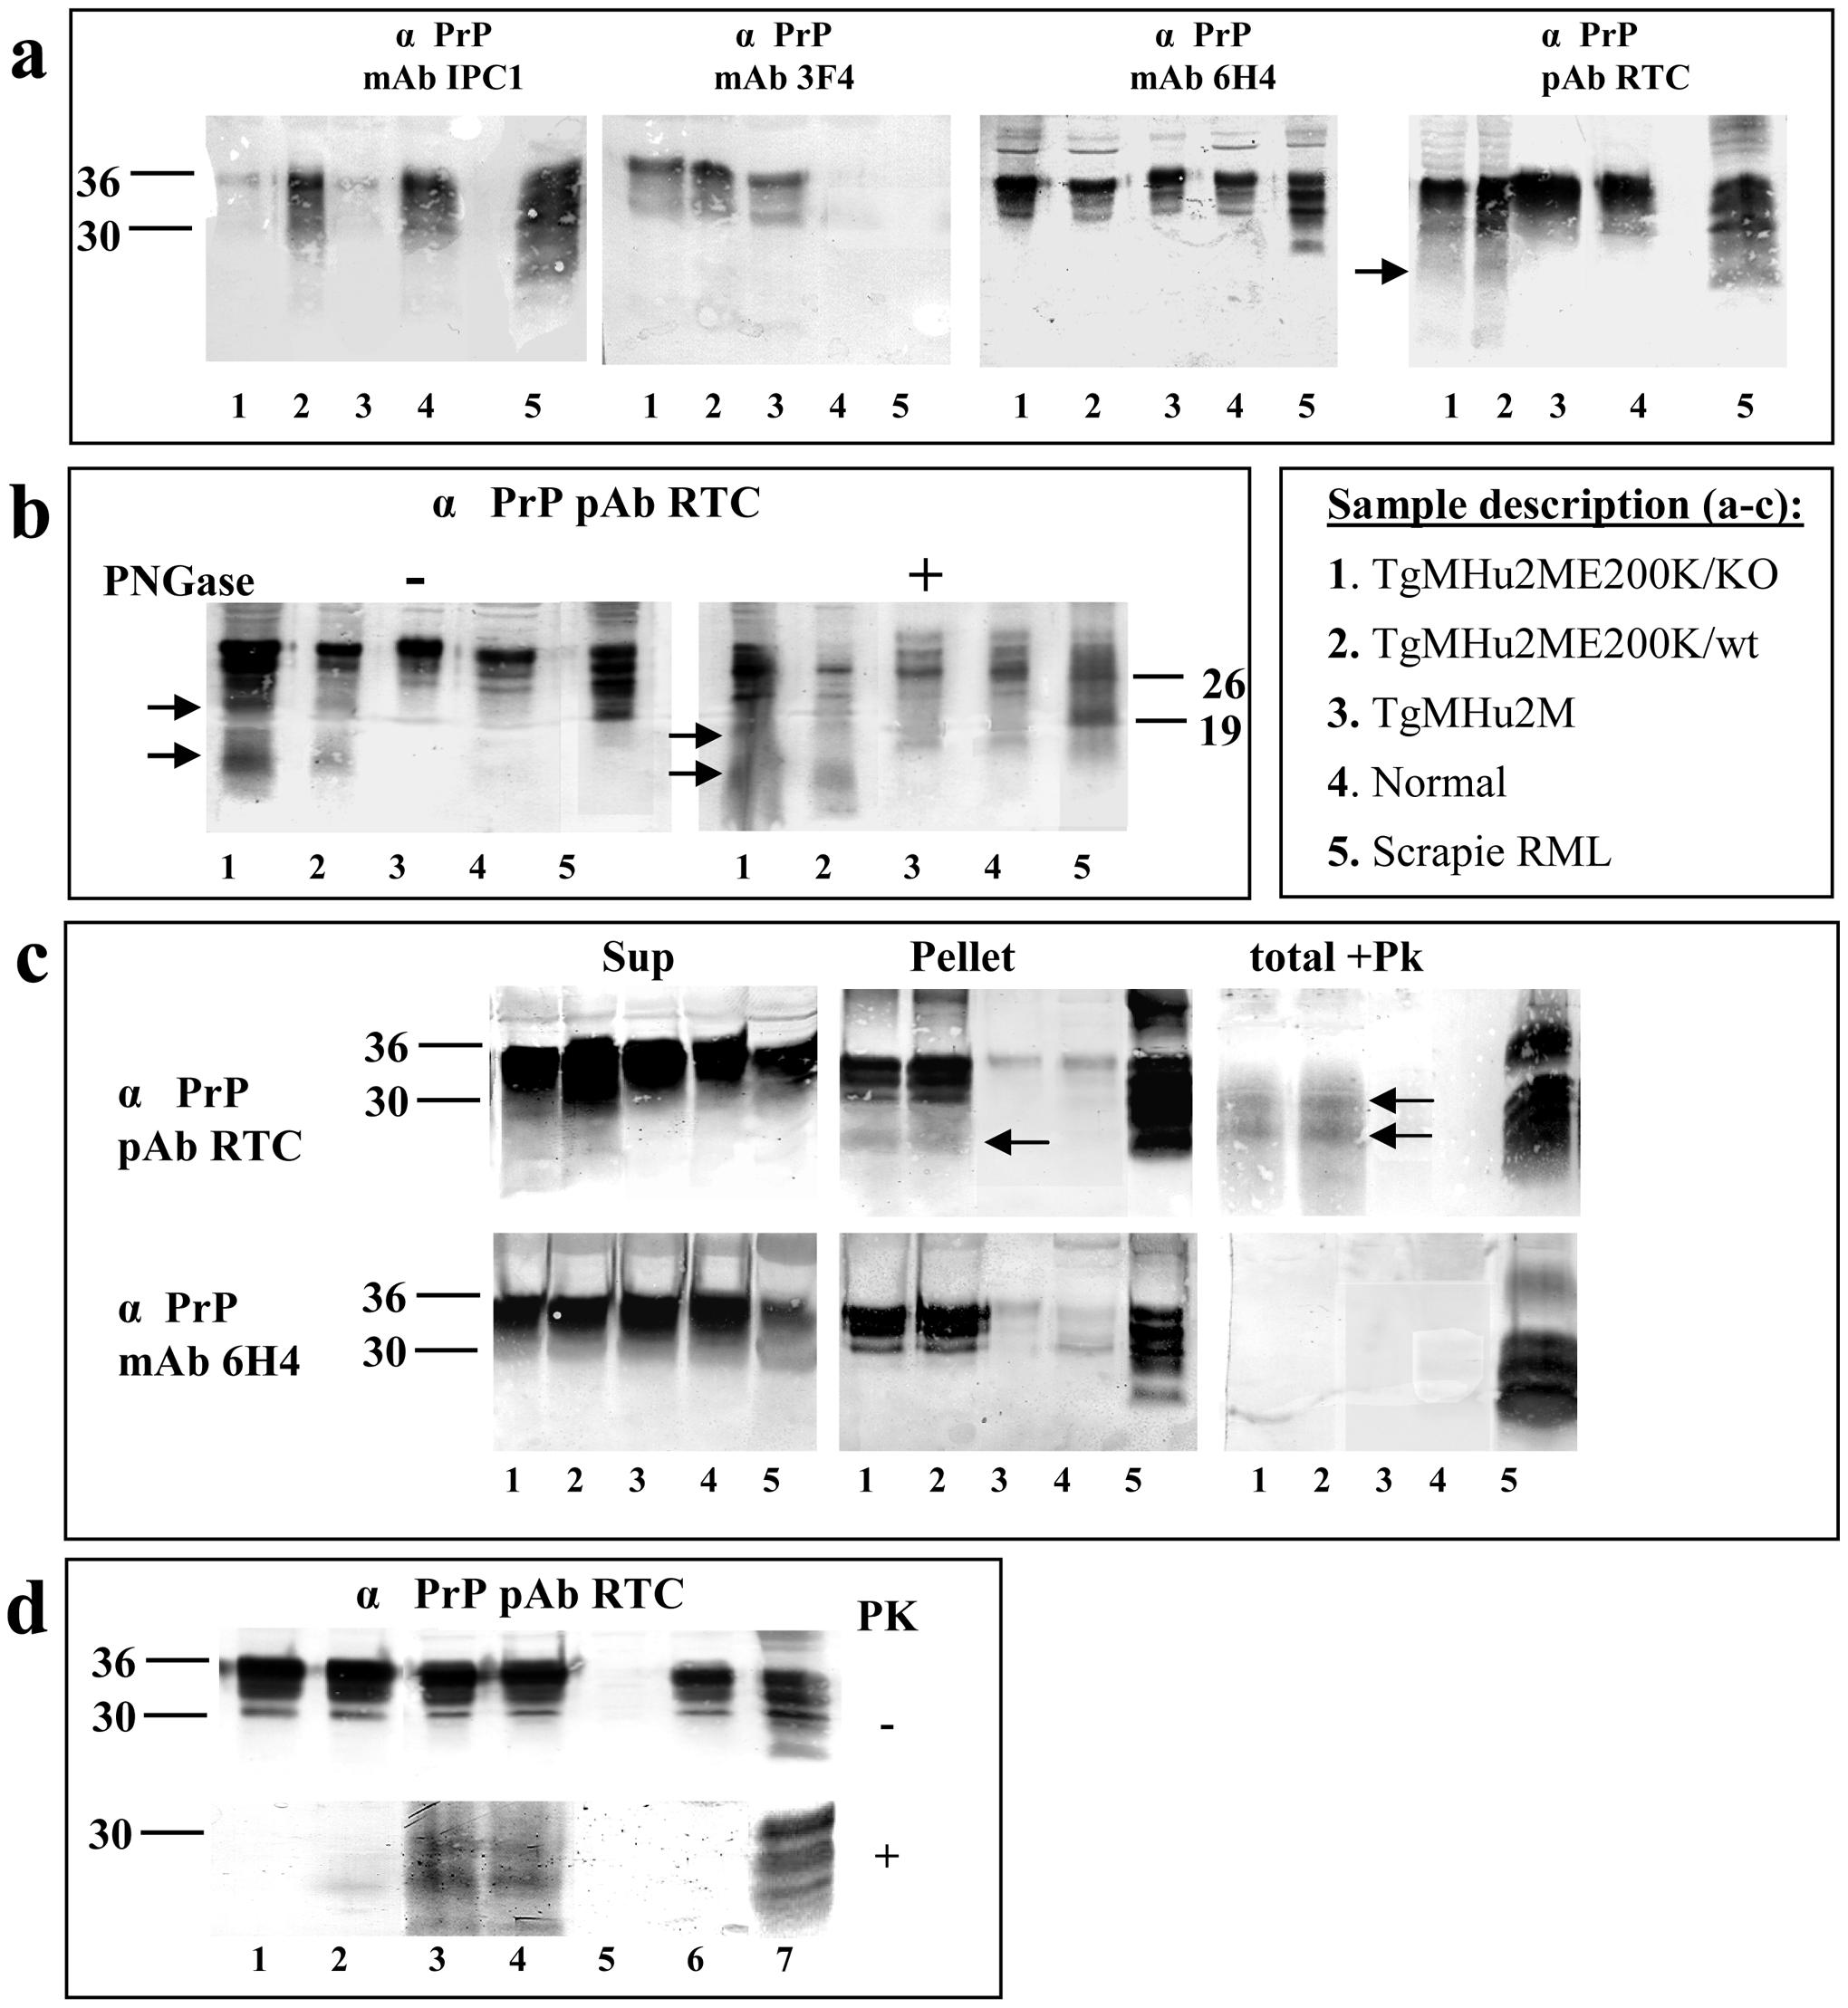 Biochemical Characterization of PrP in TgMHu2ME199K mice.